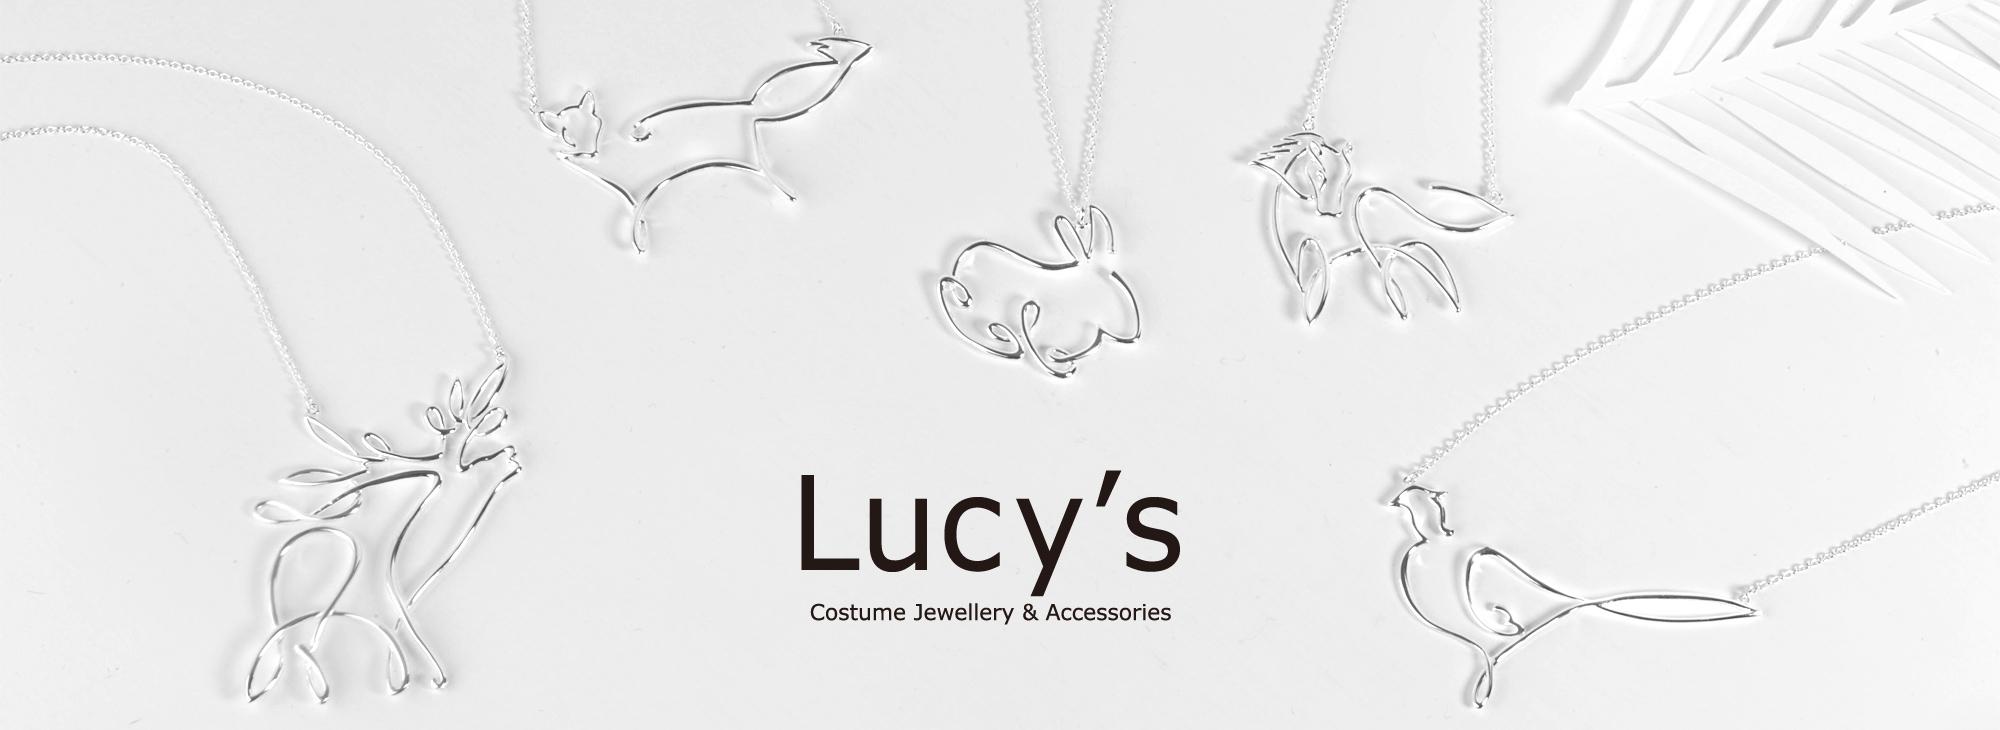 lucys純銀保養